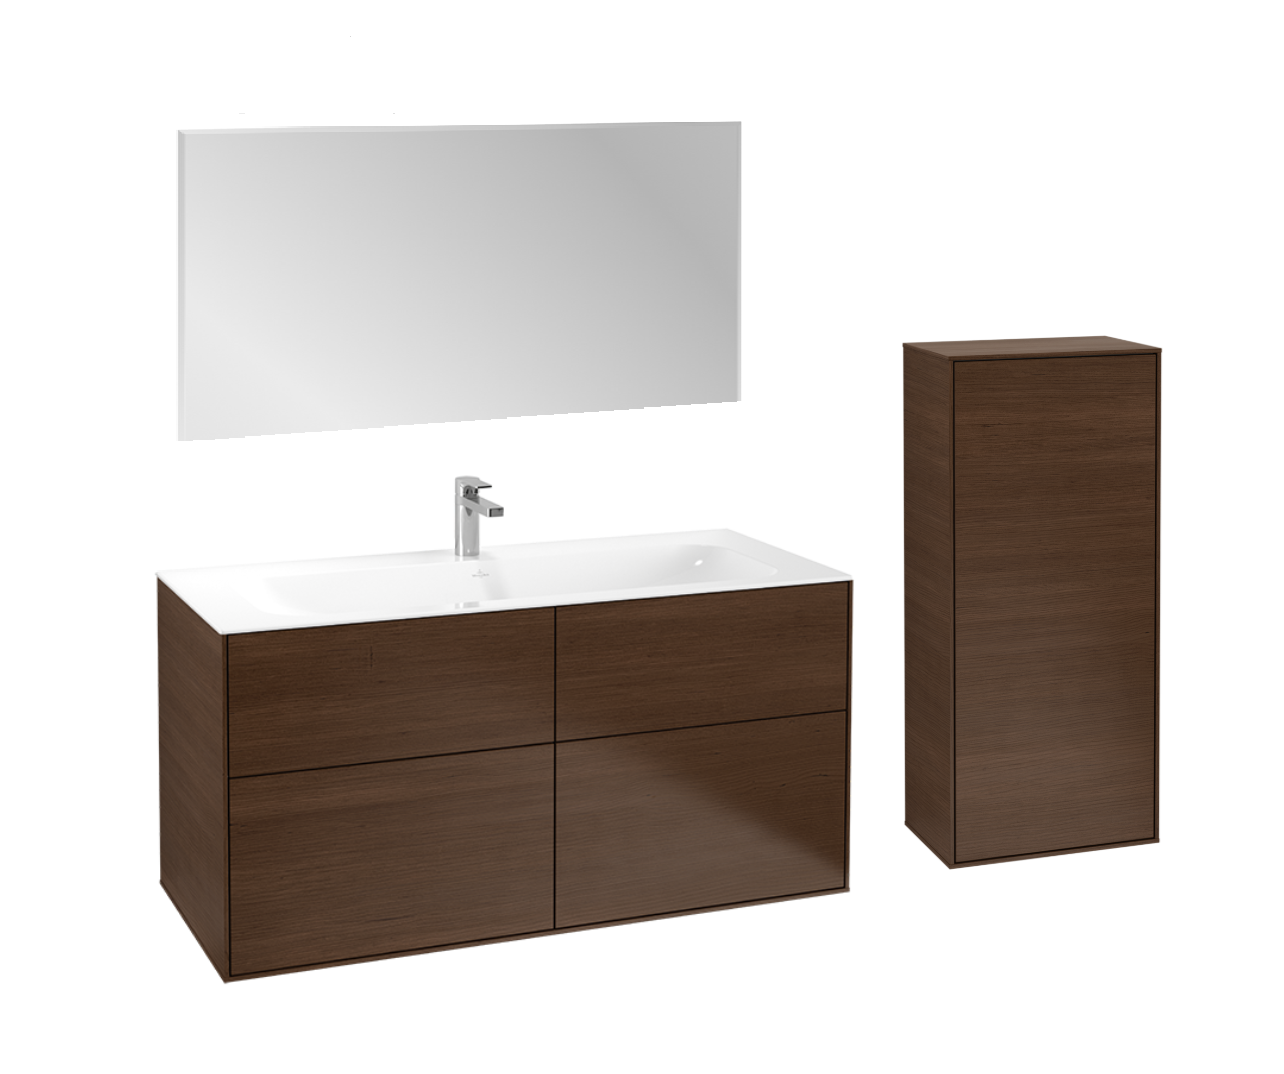 Villeroy & Boch Finion badmeubelset 3 - 120 cm wastafelonderkast, wastafel, zijkast en spiegel